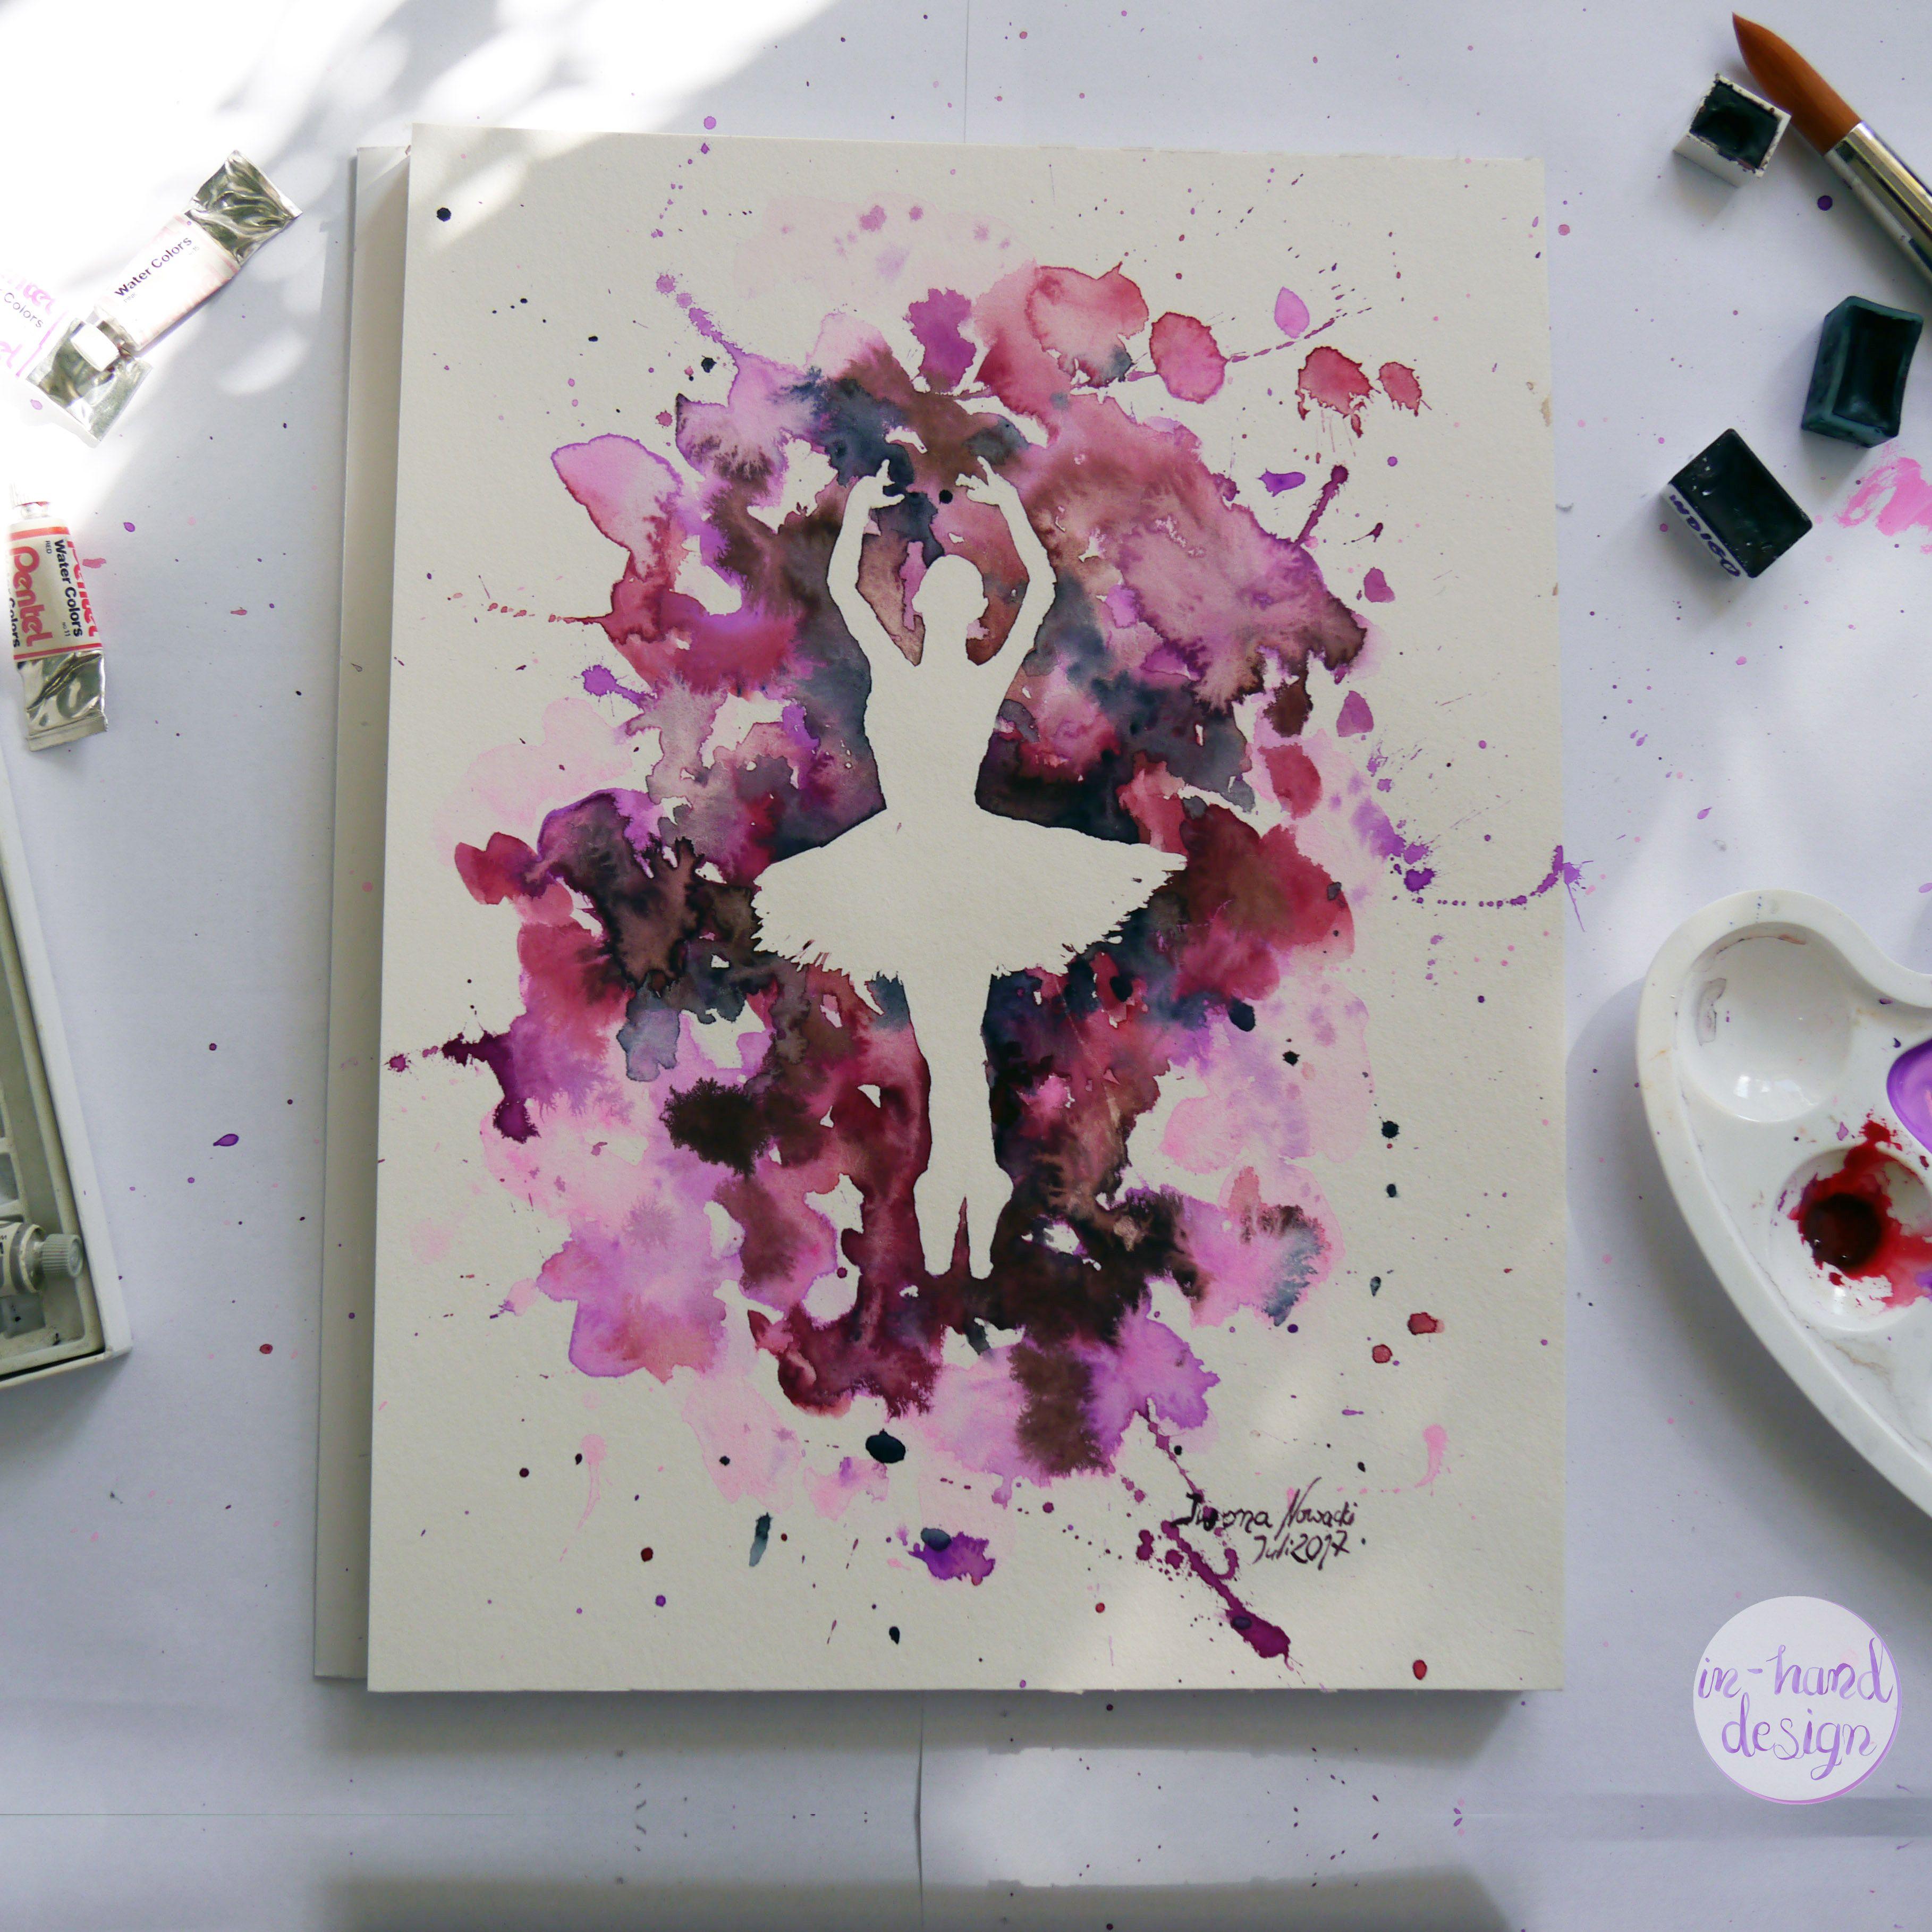 Ballerina In Aquarell Ein Effektvolles Bild Malen Ballerina